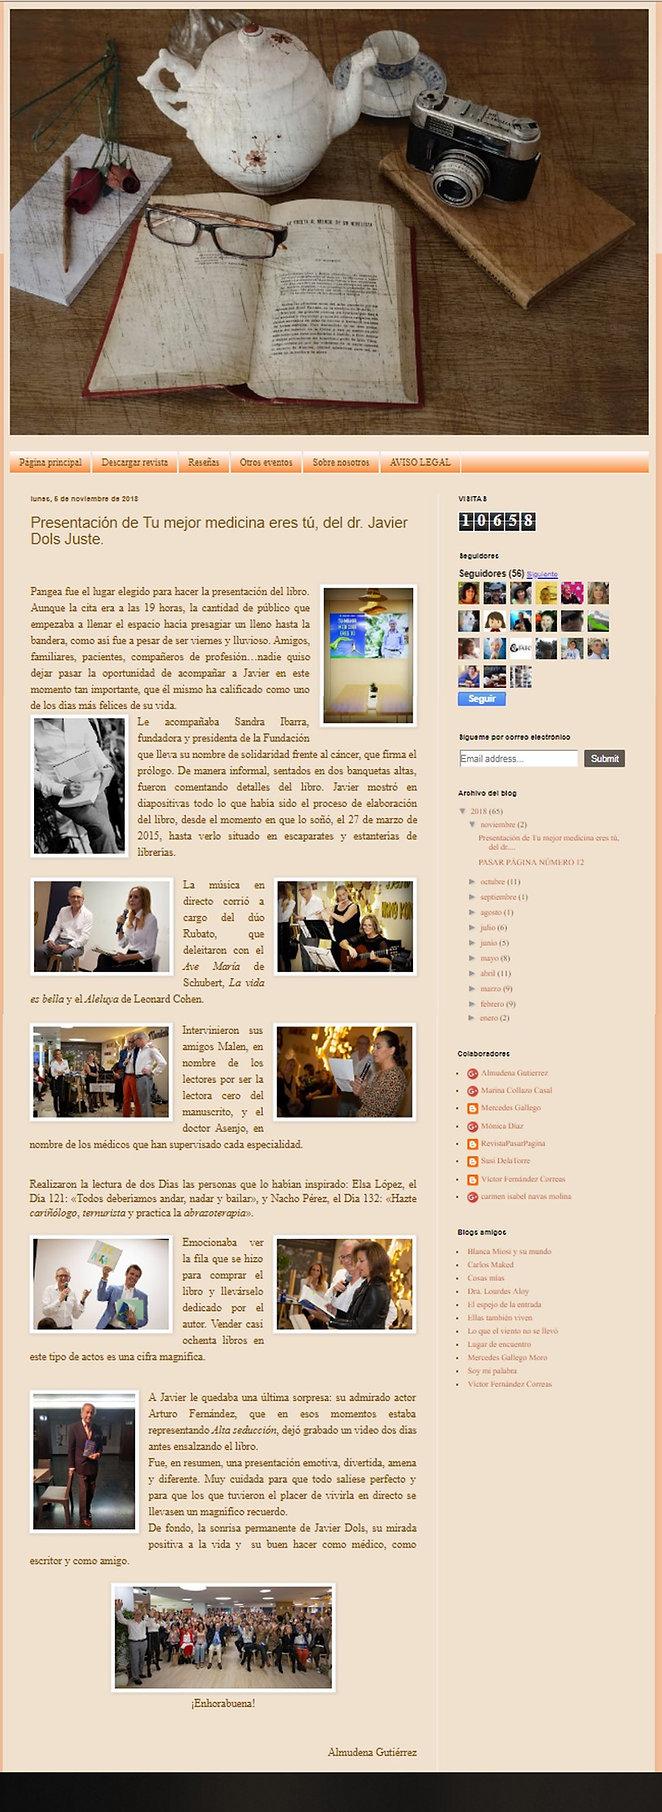 blog almudena.jpg